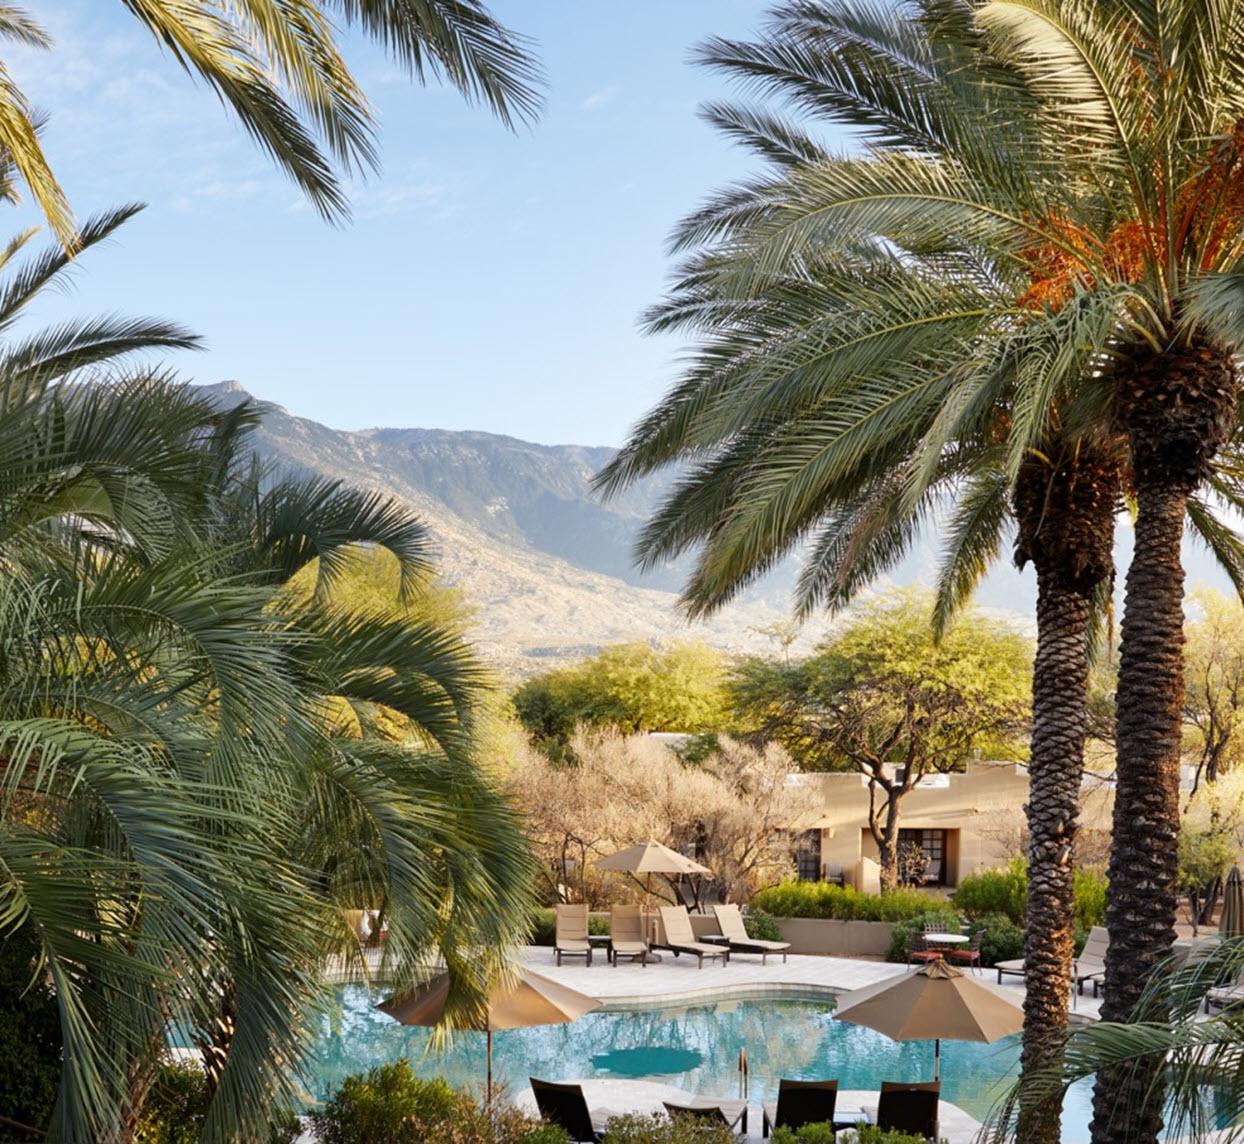 Wellness Getaway to Miraval Resort & Spa in Arizona Sweepstakes